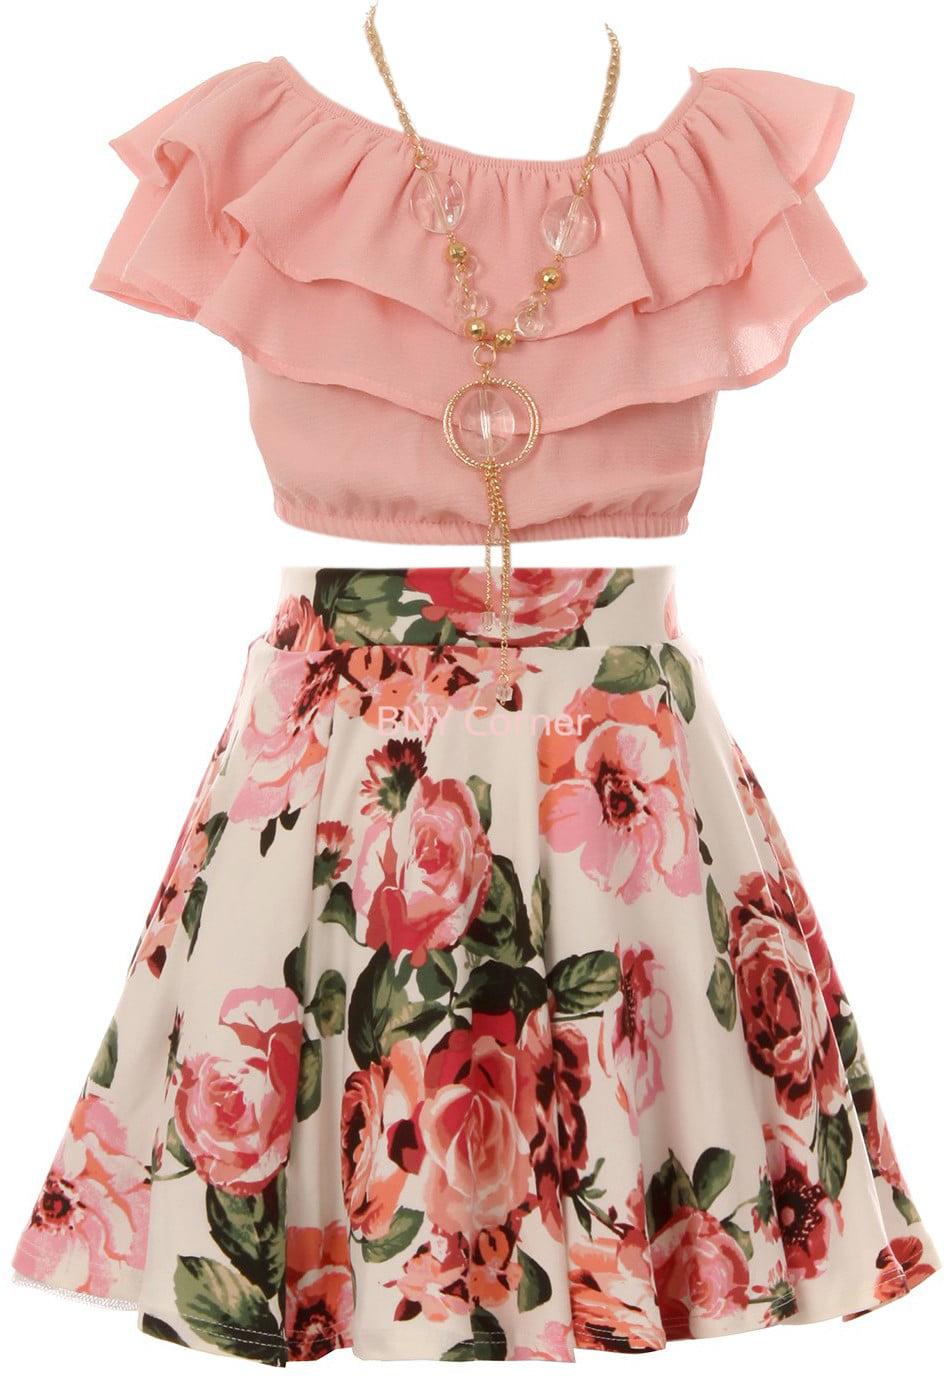 Kiddie Korral Toddler-Girls Girls Sequin Ruffle Shirt and Skirt Set 25P